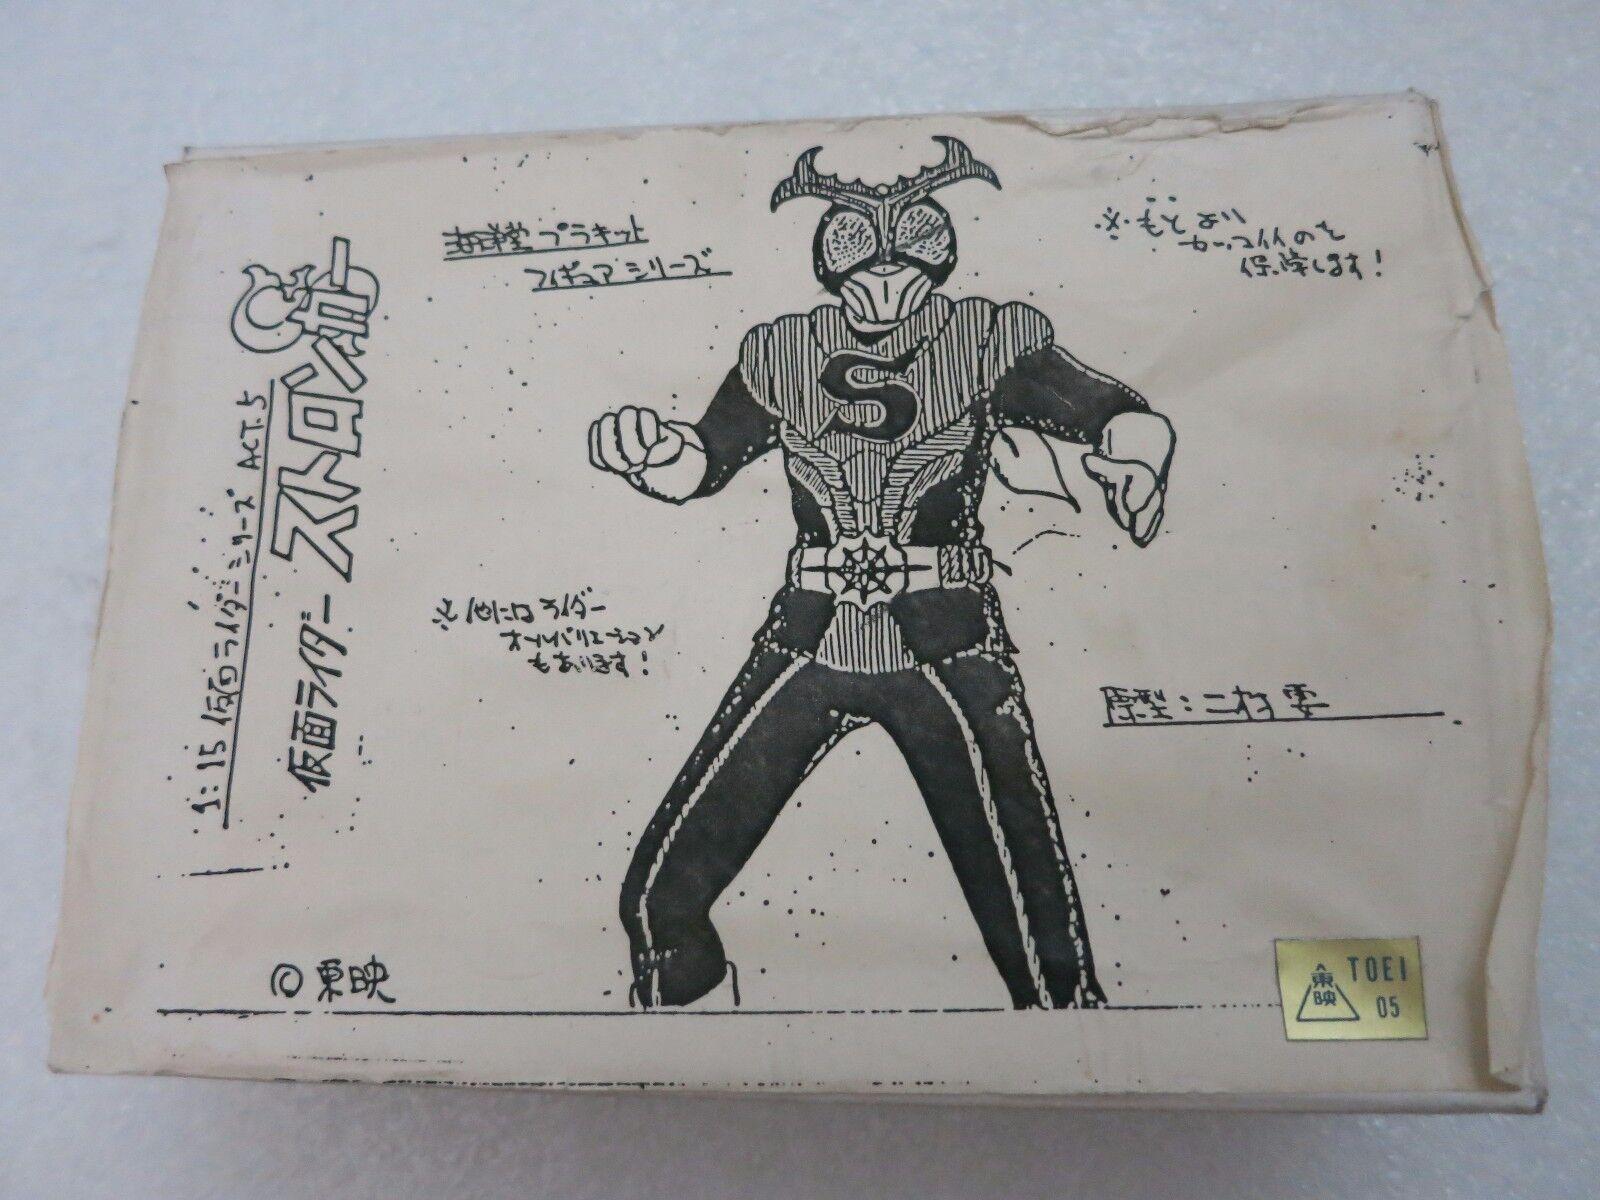 Japan Kaiyodo vintage 1 15 masked kamen rider stronger resin model figure kit